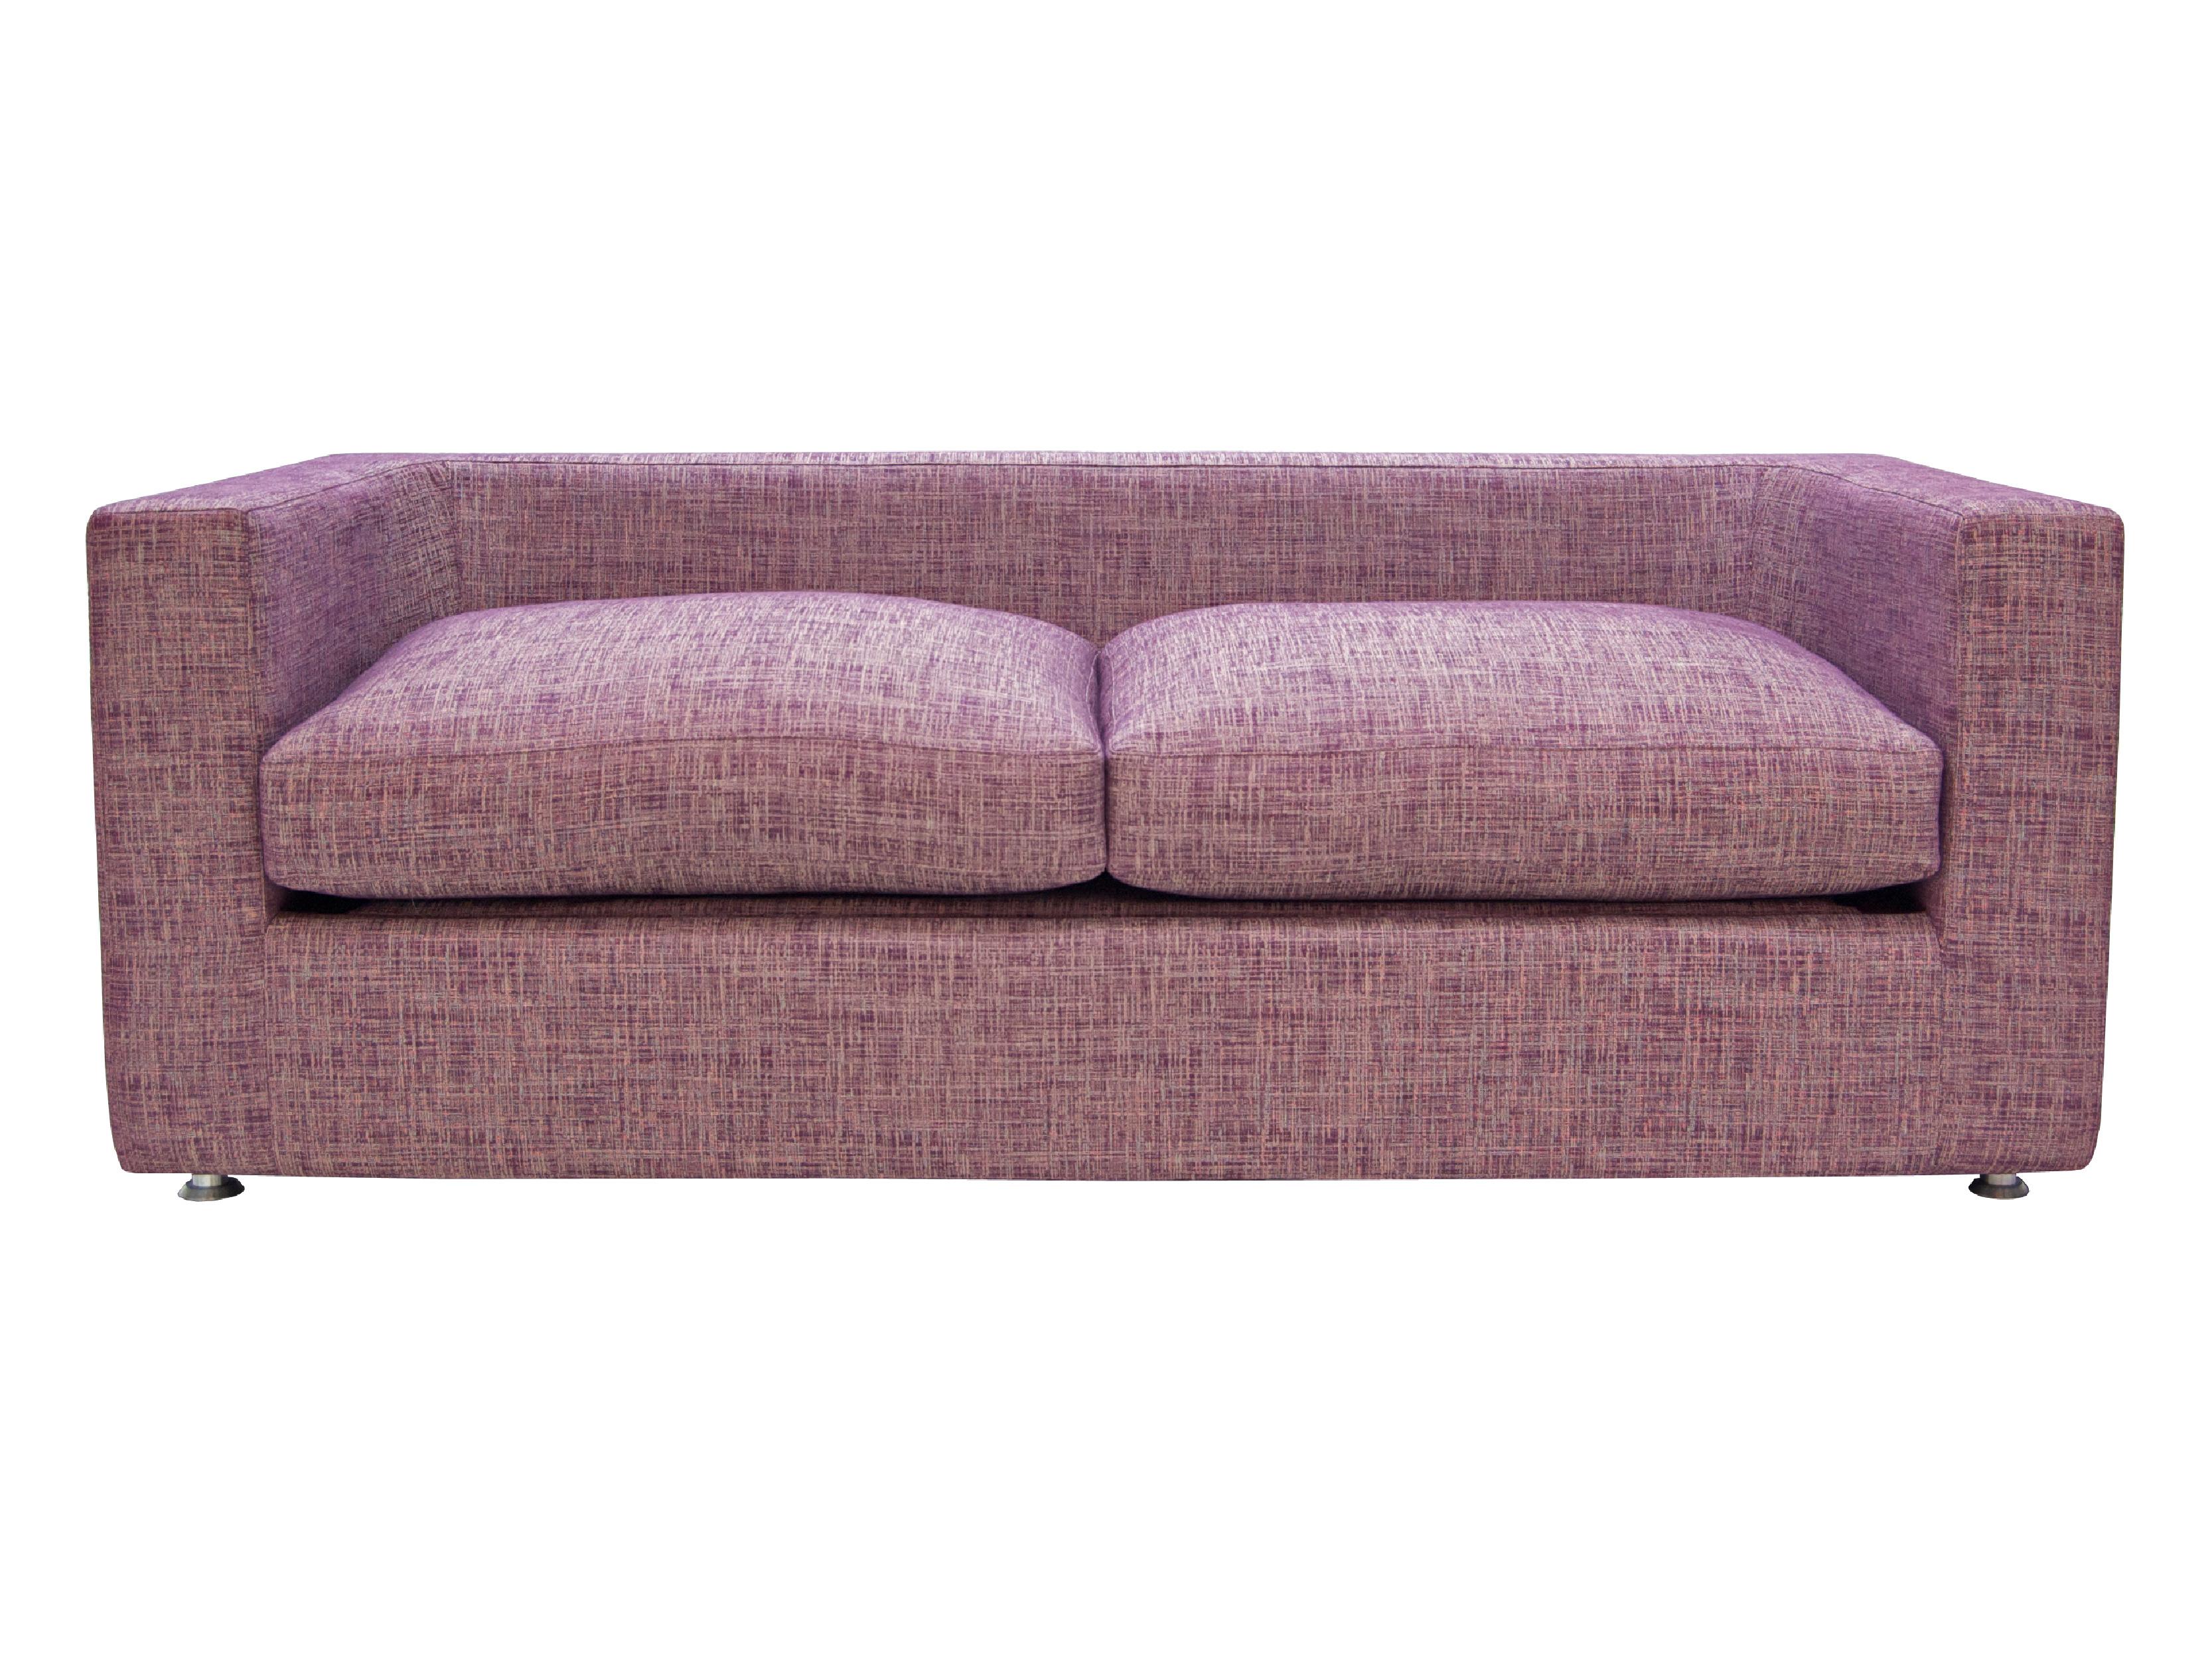 sofas-main-galleries-ultra-bespoke-26